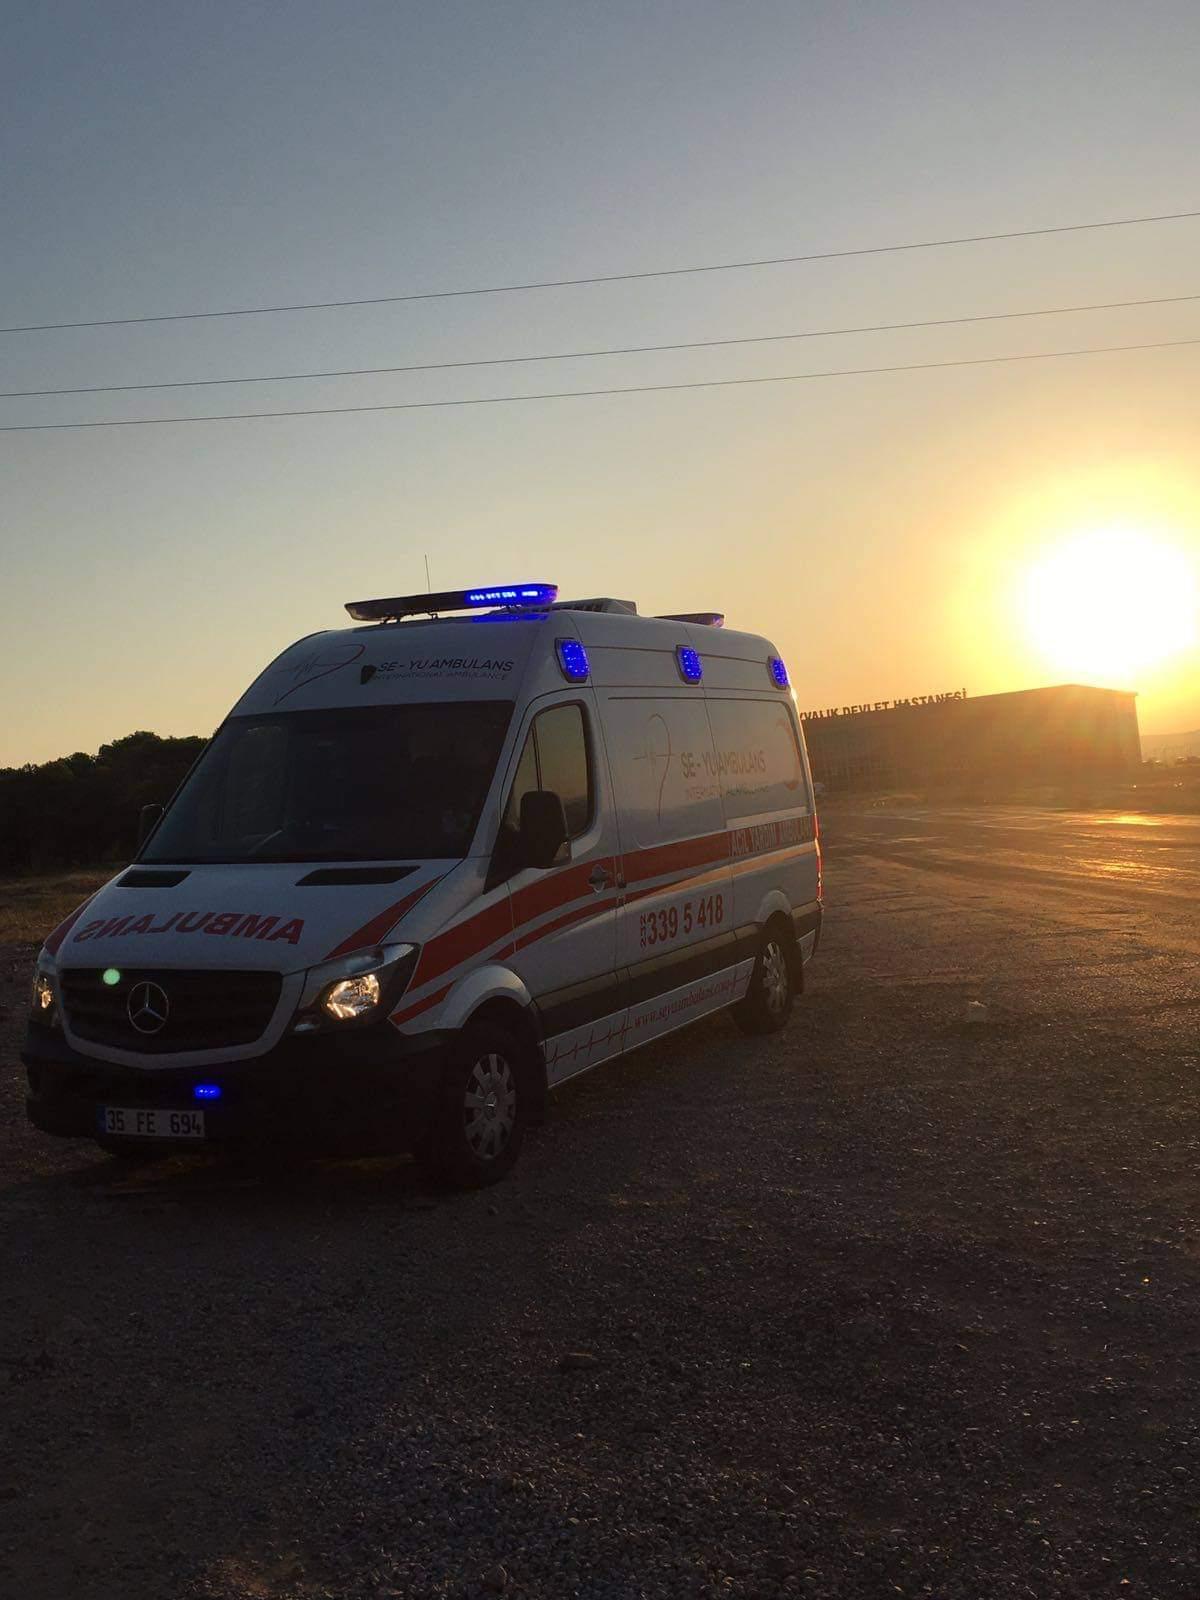 özel ambulans incirliova